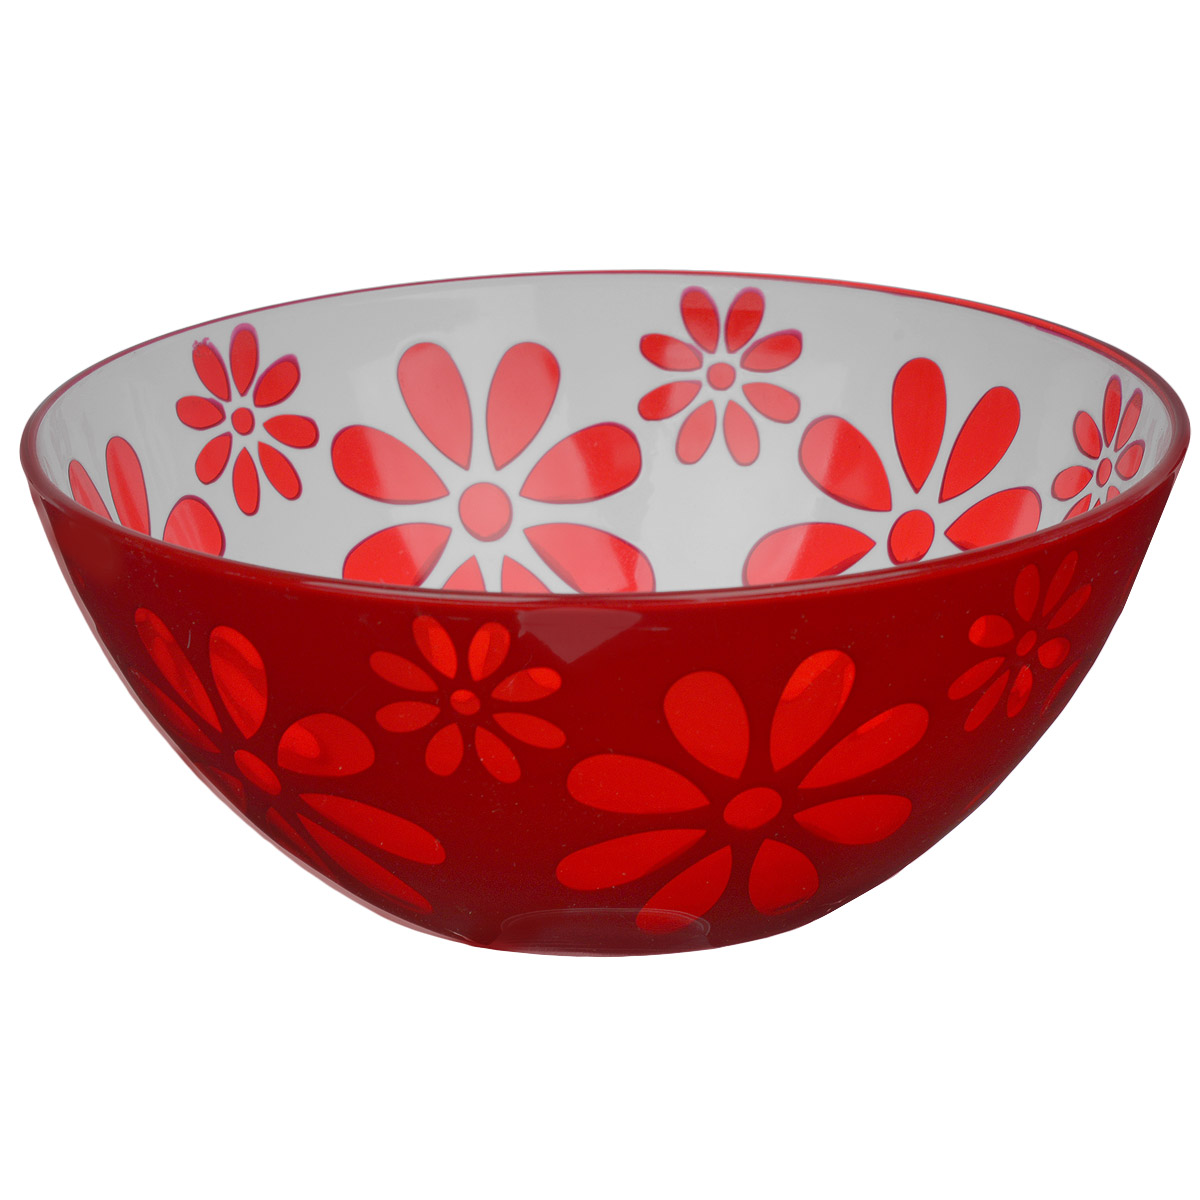 Чаша Альтернатива Соблазн, цвет: красный, 1,7 л чаша альтернатива соблазн цвет красный 1 7 л